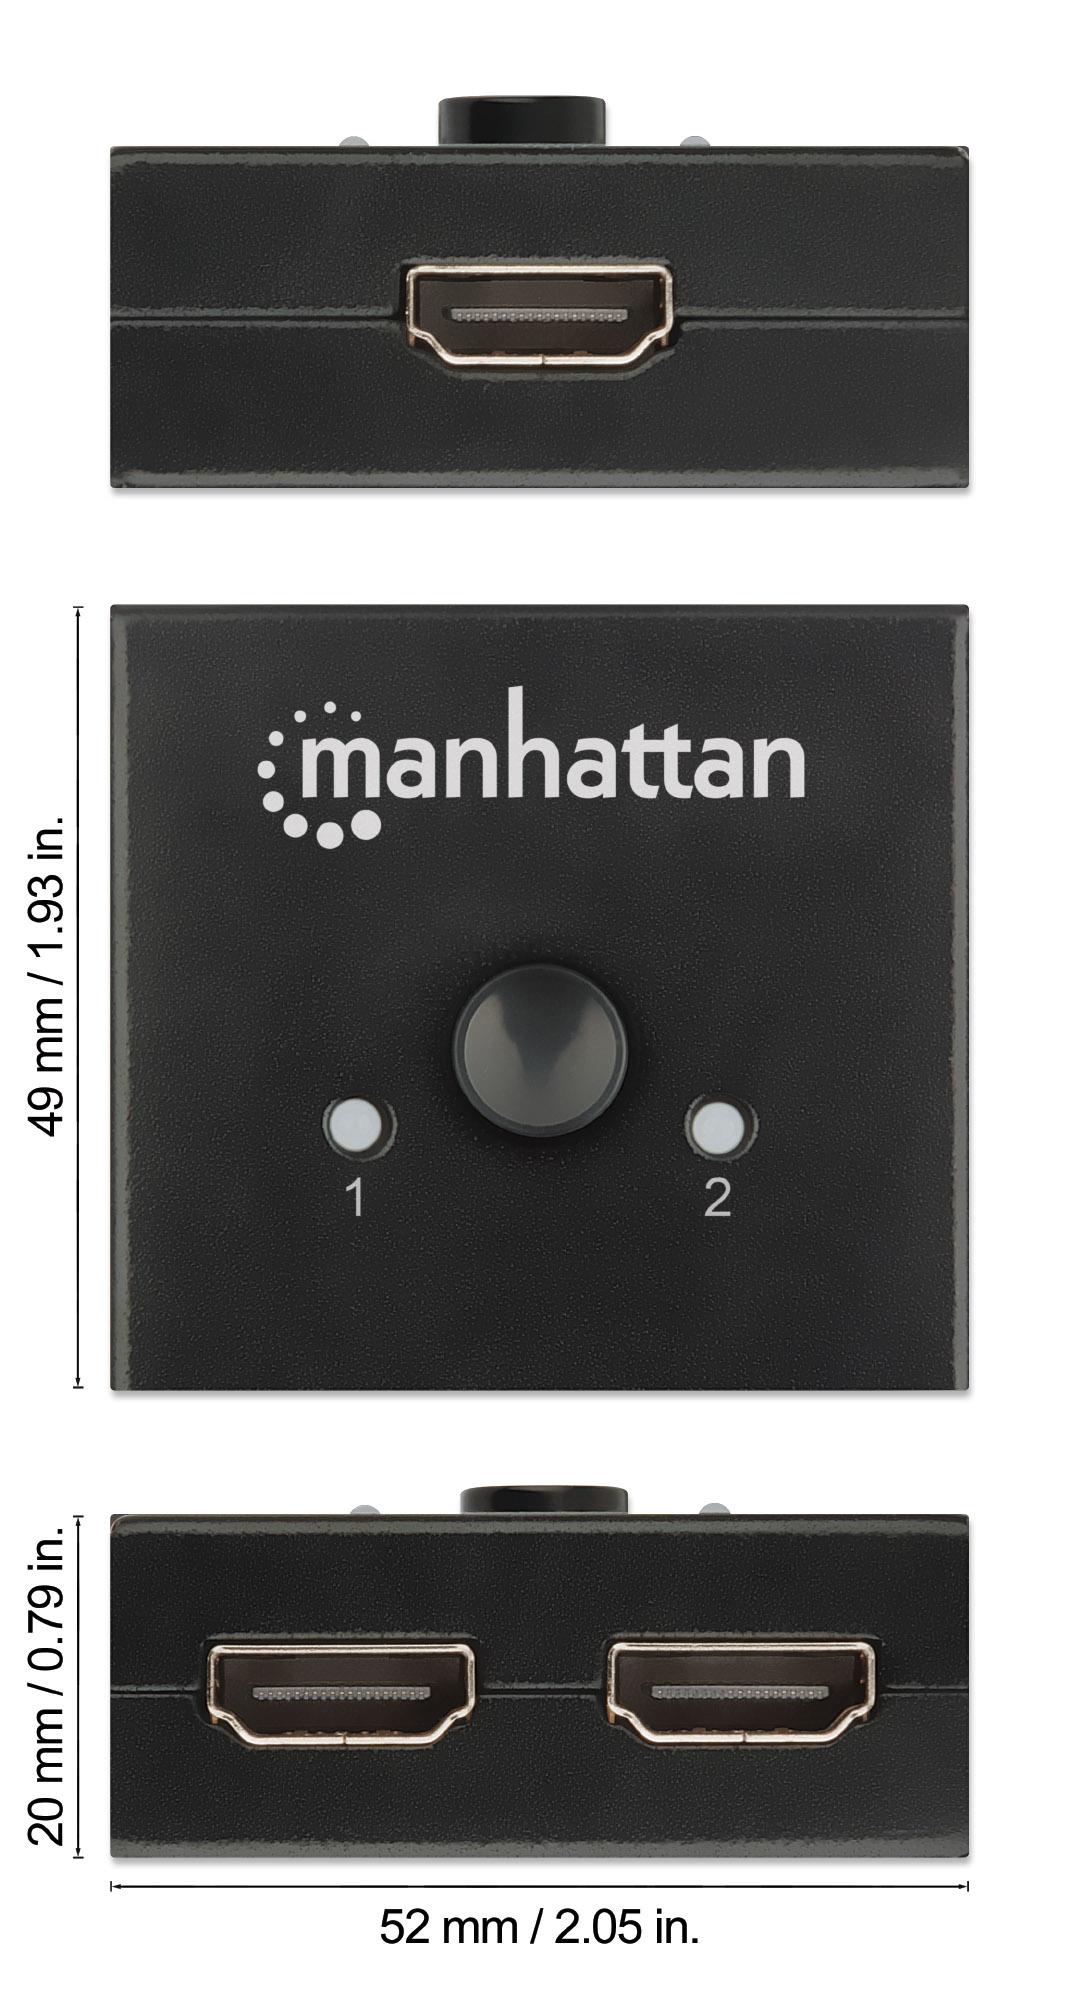 4K Bi-Directional 2-Port HDMI Splitter/Switch